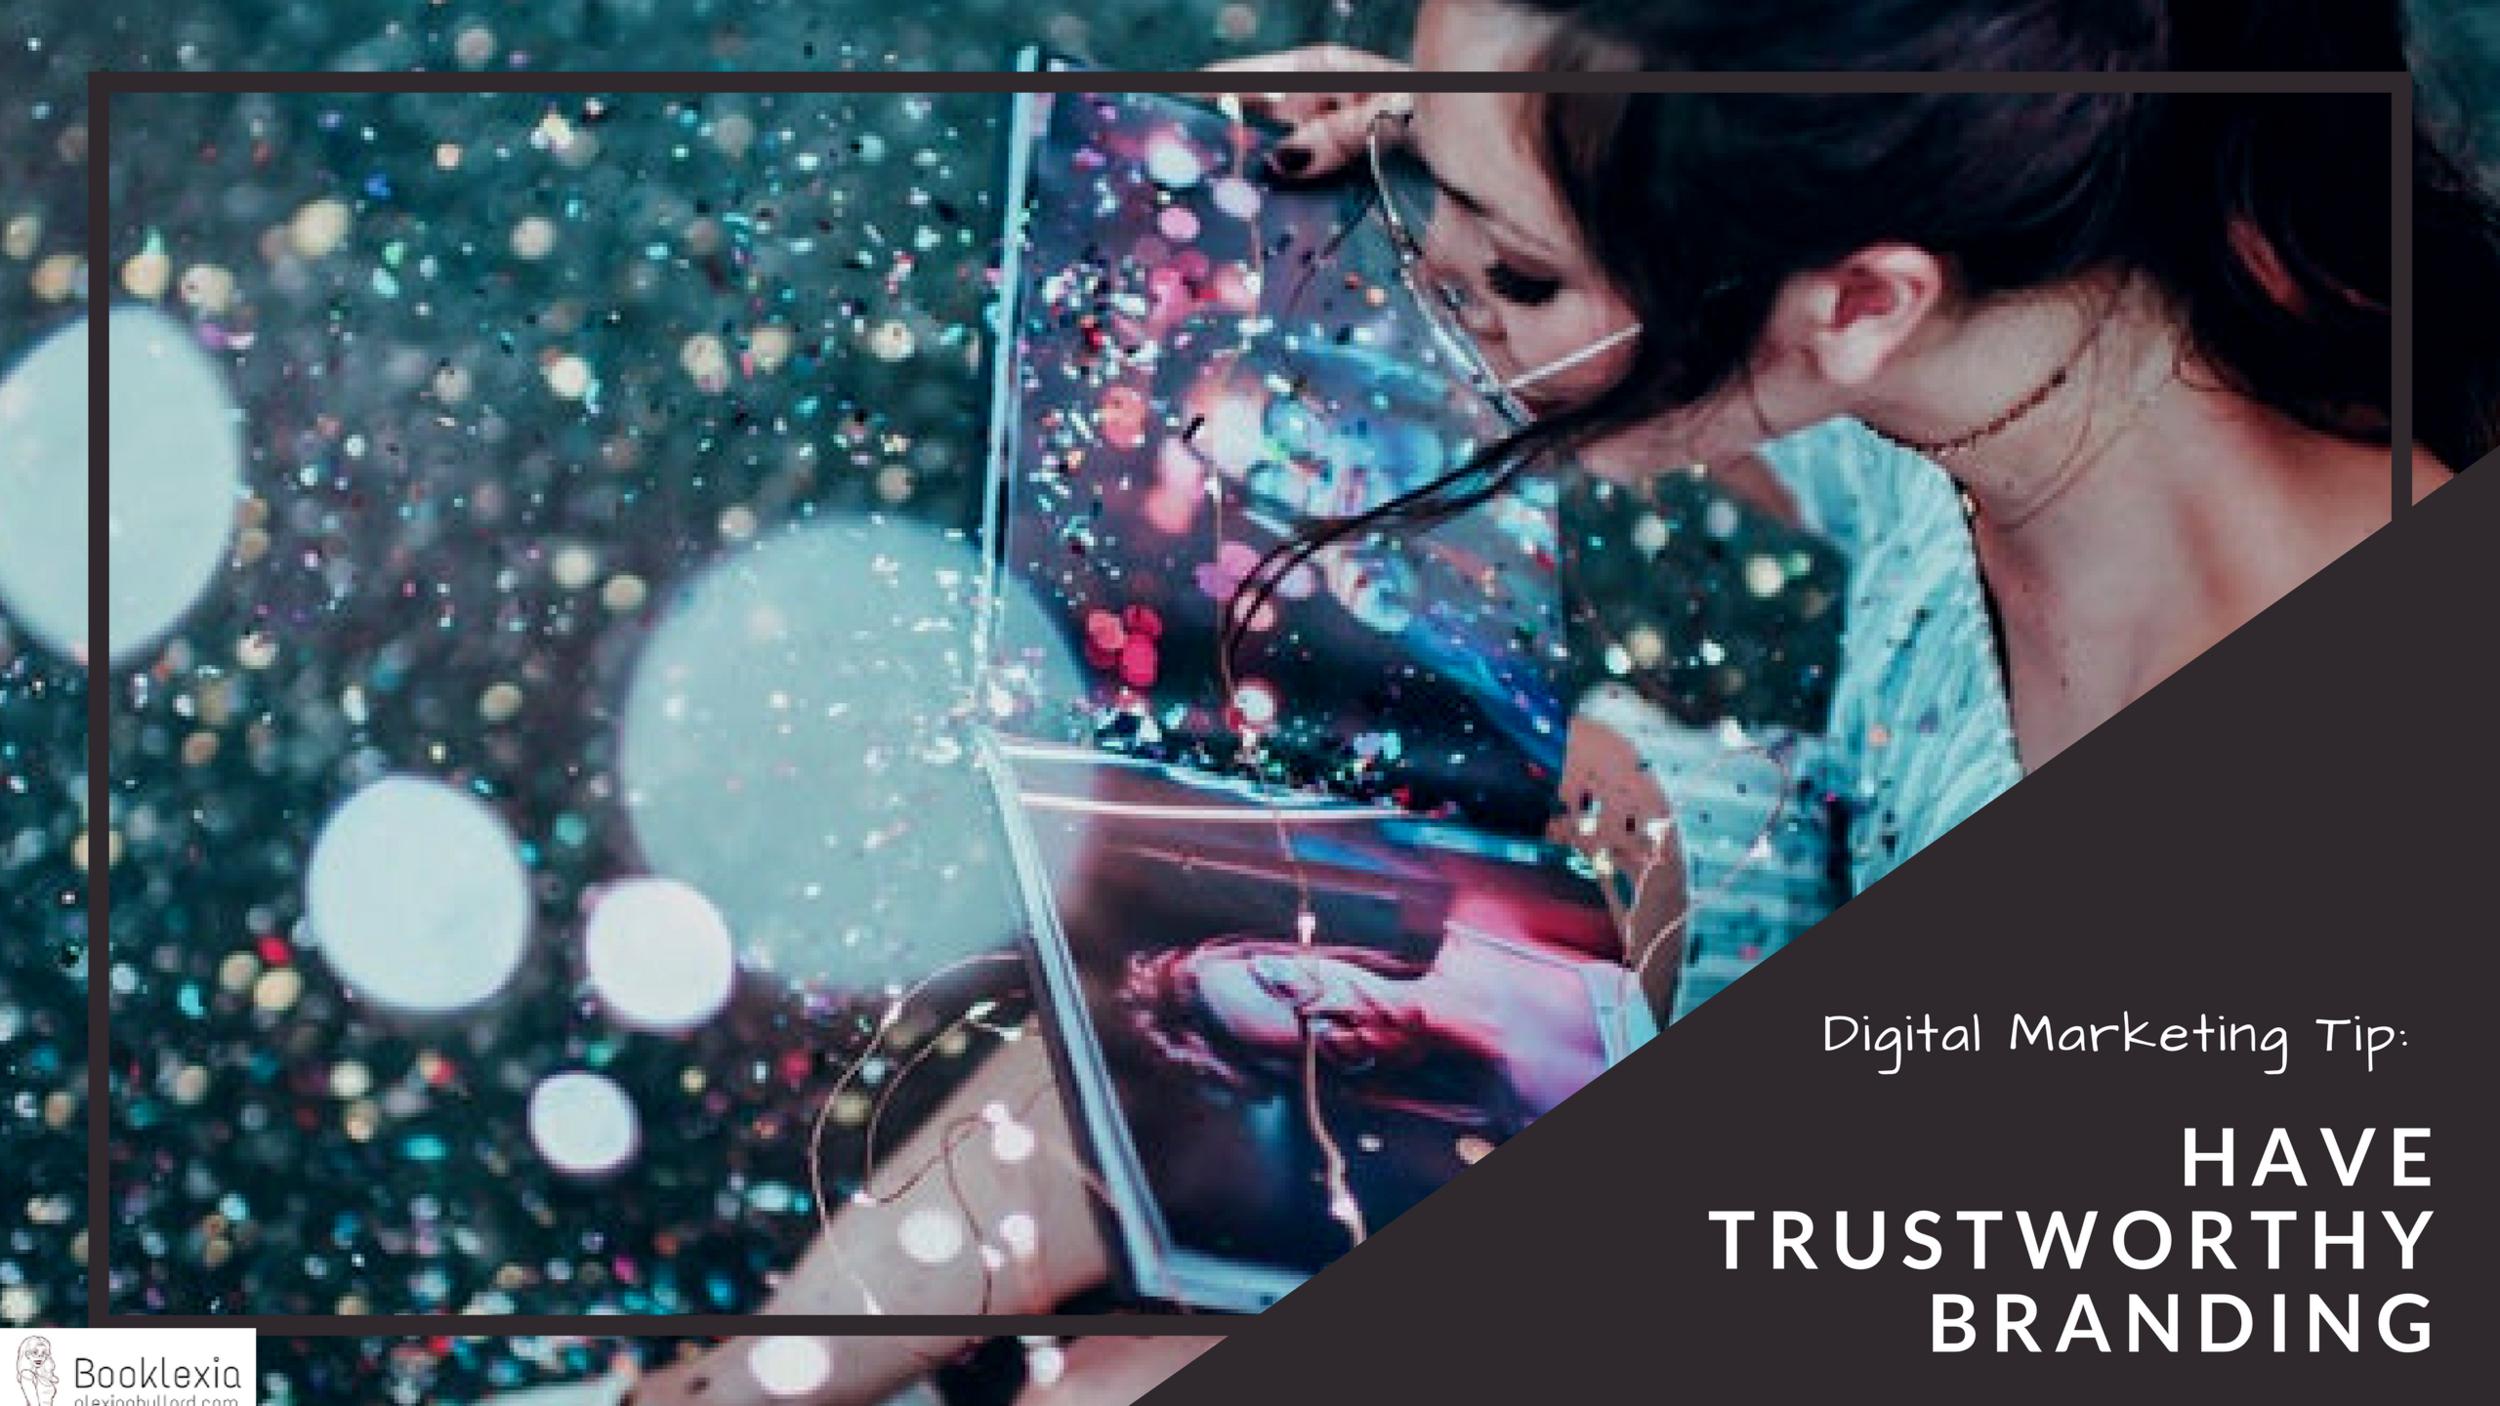 Digital Marketing Tips for Dispensaries    Building a Trustworthy Brand Image    alexiapbullard.com